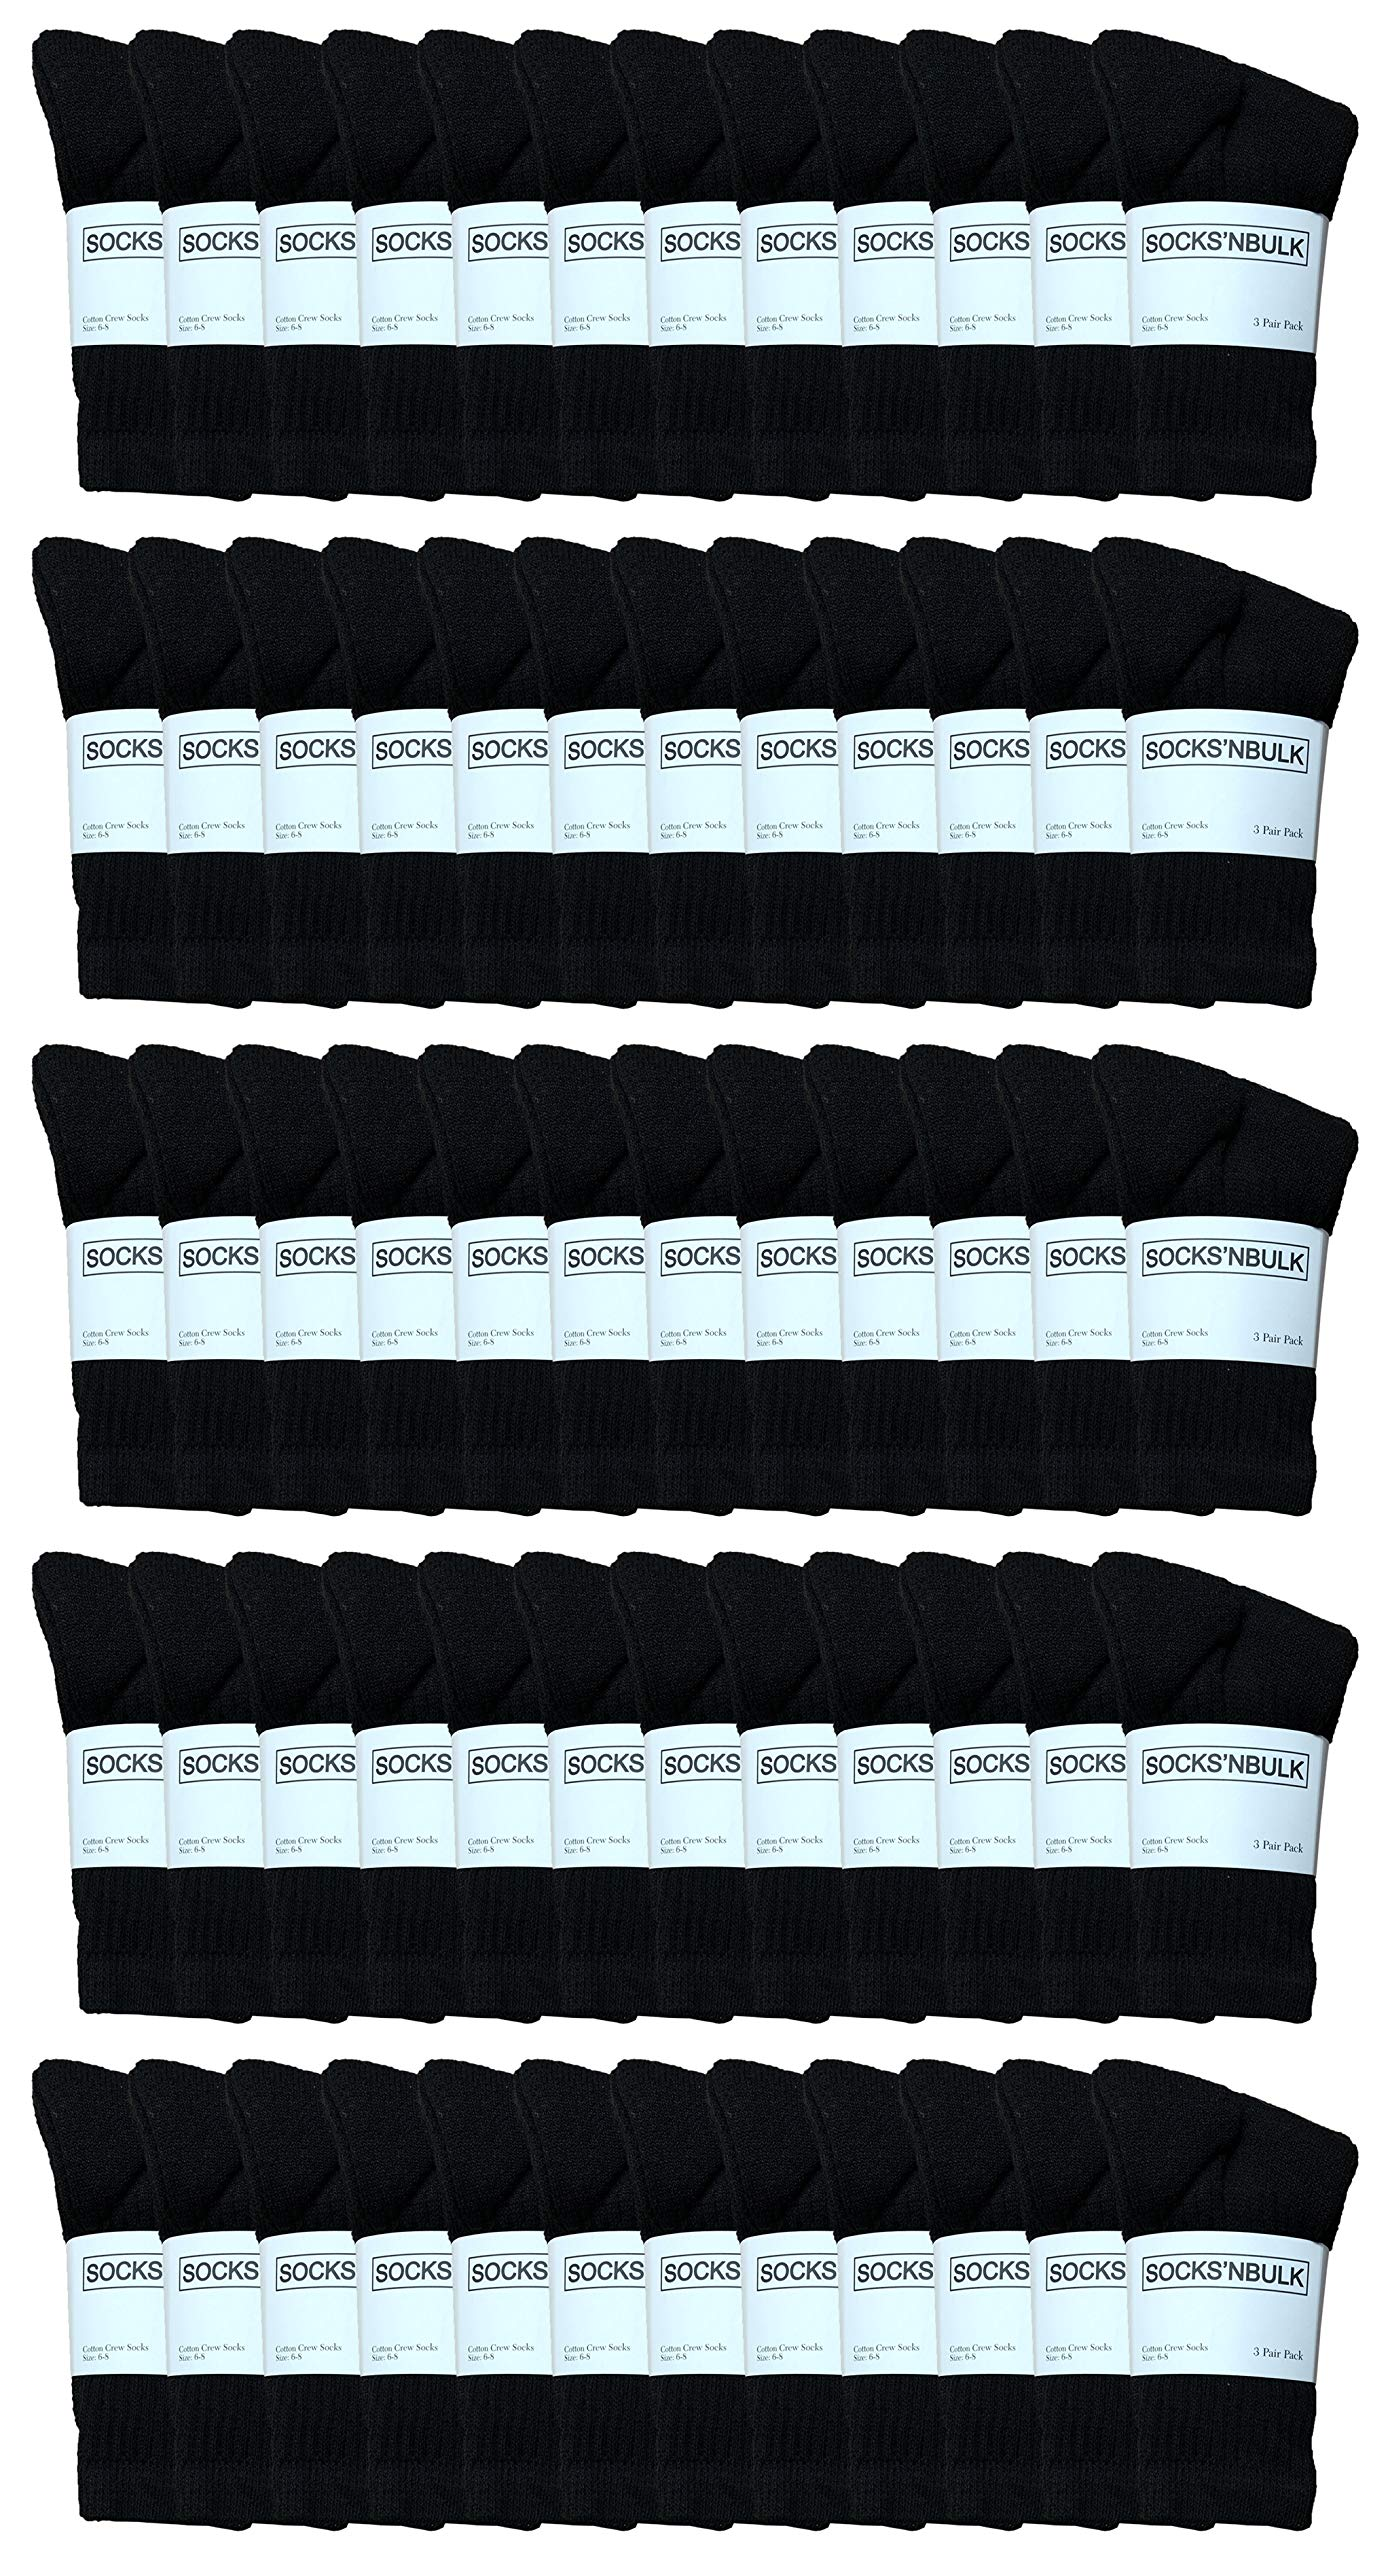 Yacht & Smith 60 Pairs of Kids Sports Crew Socks, Wholesale Bulk Pack Sock for Boys & Girls, by SOCKS'NBULK (6-8 Boys, Black) by Yacht & Smith